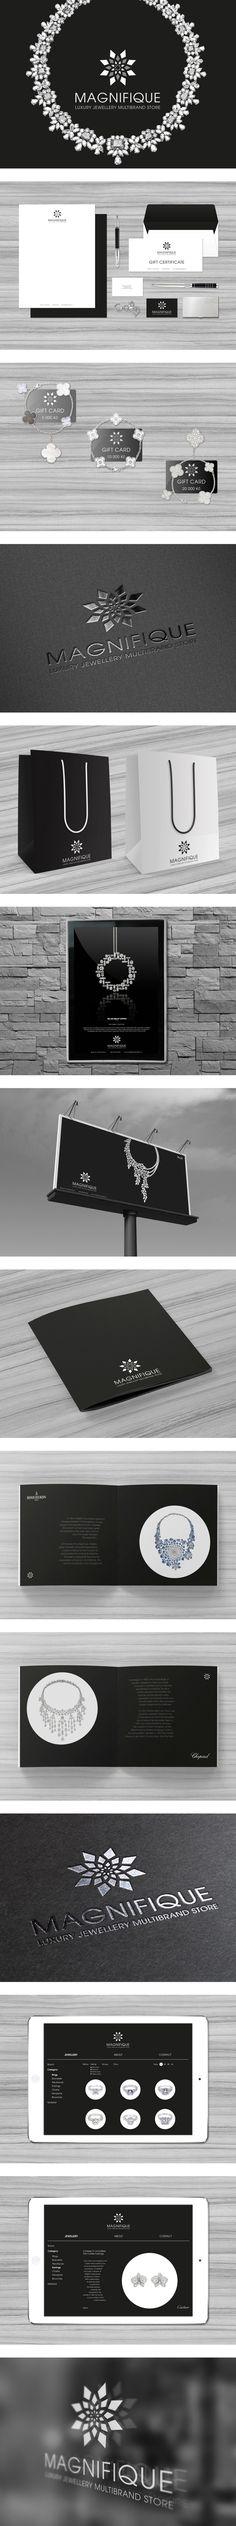 MAGNIFIQUE Luxury Jewellery Multibrand Store by Ven Klement, via Behance